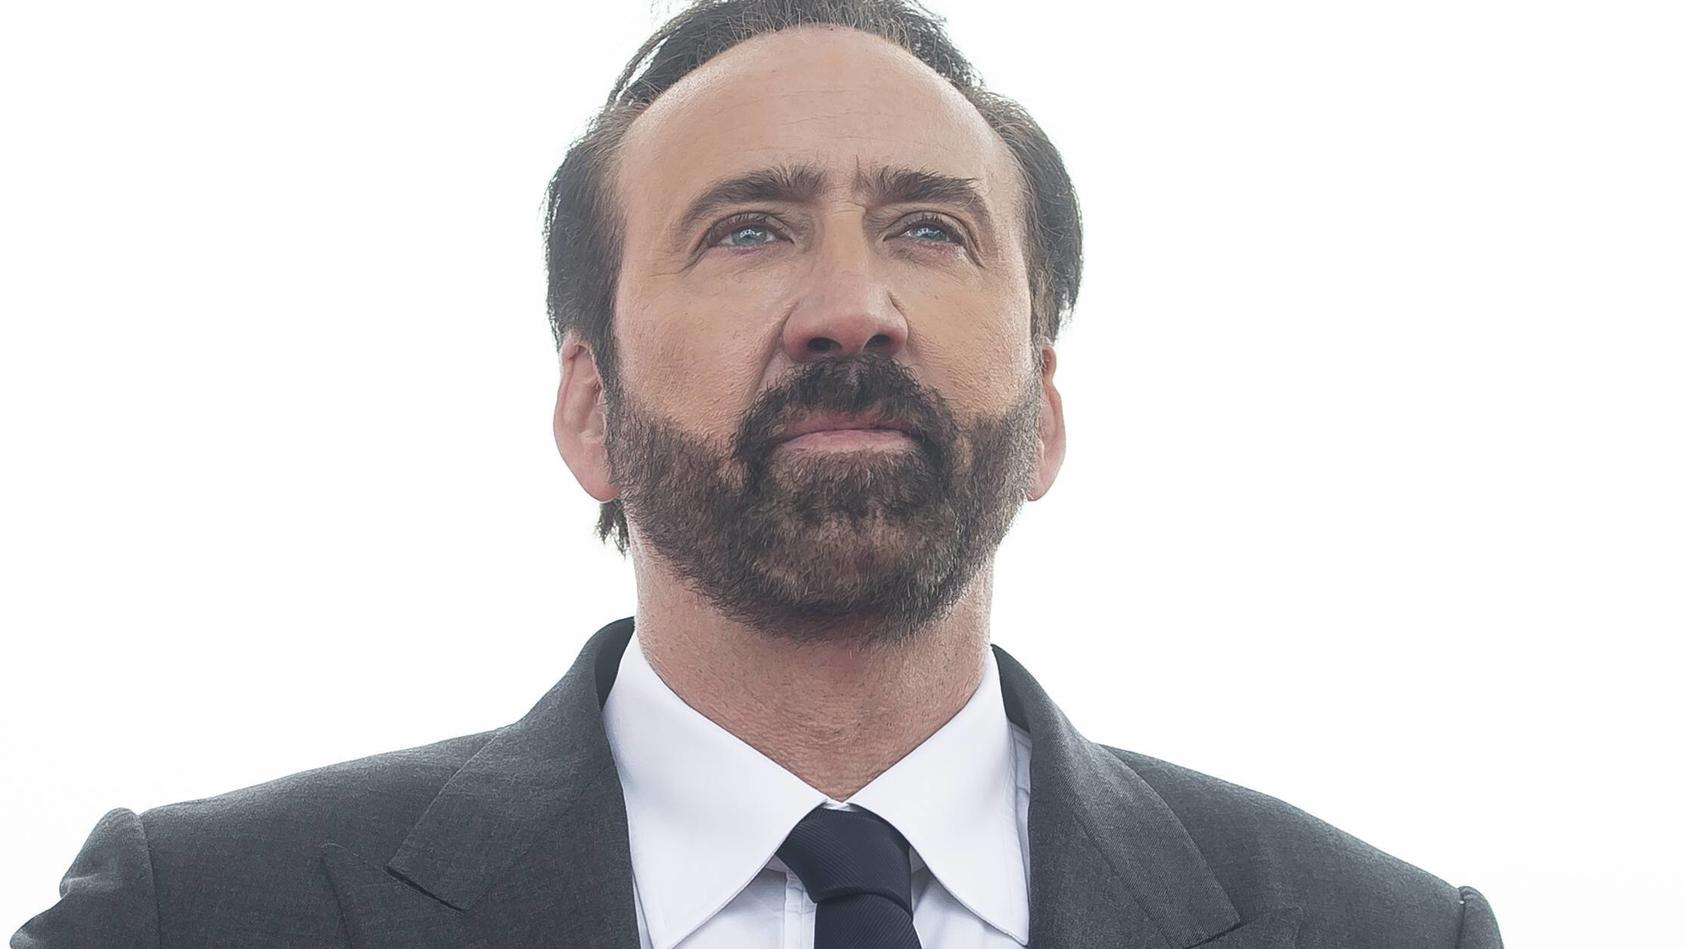 Nicolas Cage will Vier-Tage-Ehe annulieren